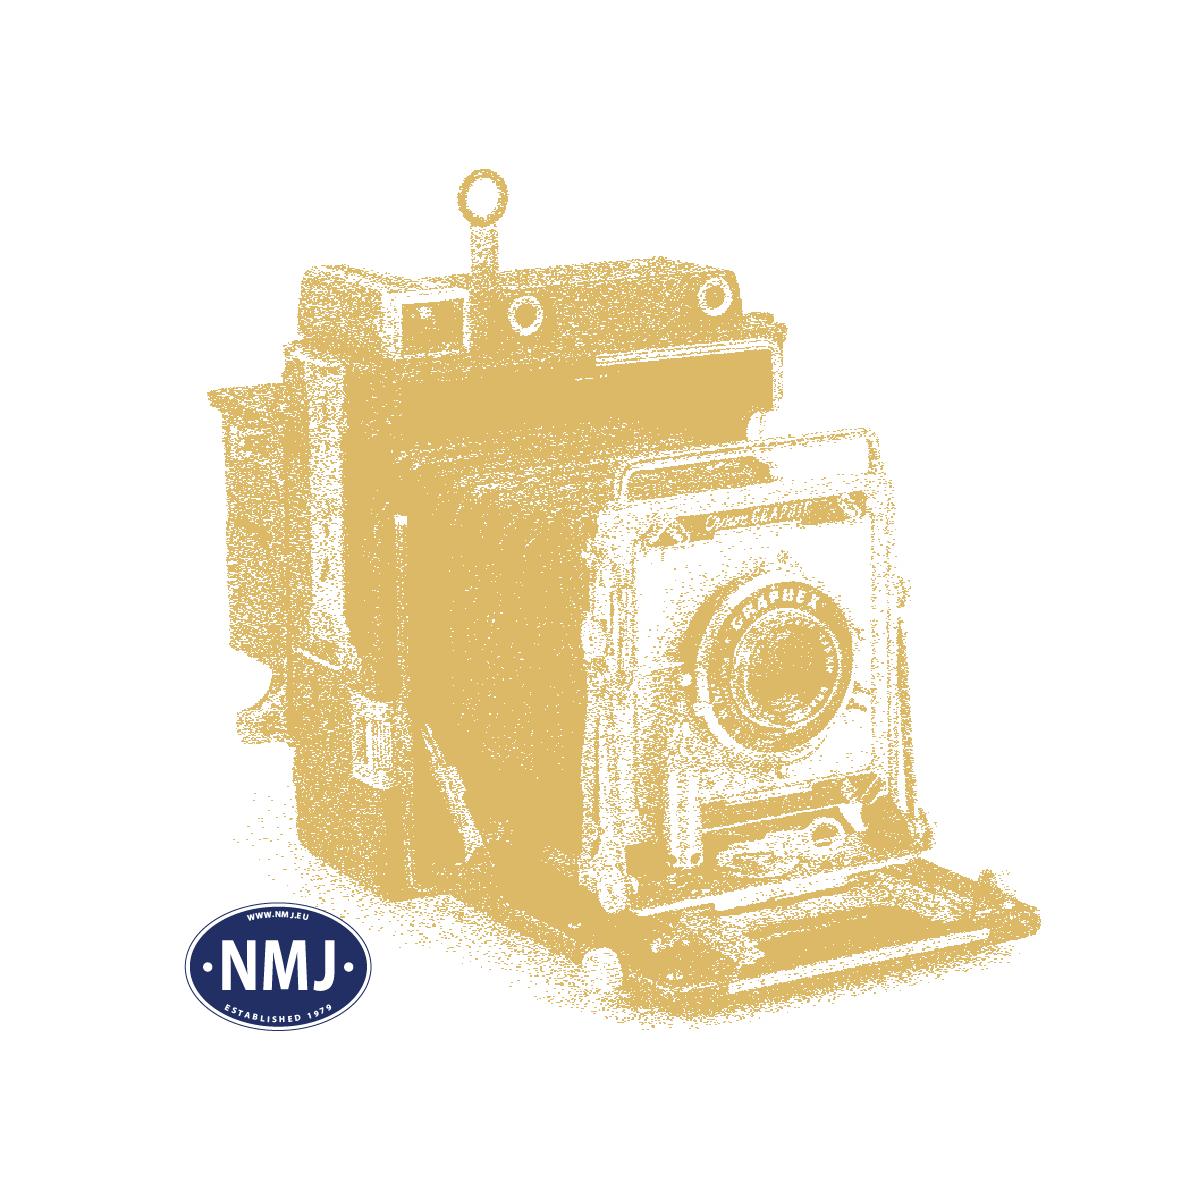 BRA3046 - Hunplugger, 2,5 mm, 10 Stk, Oransje